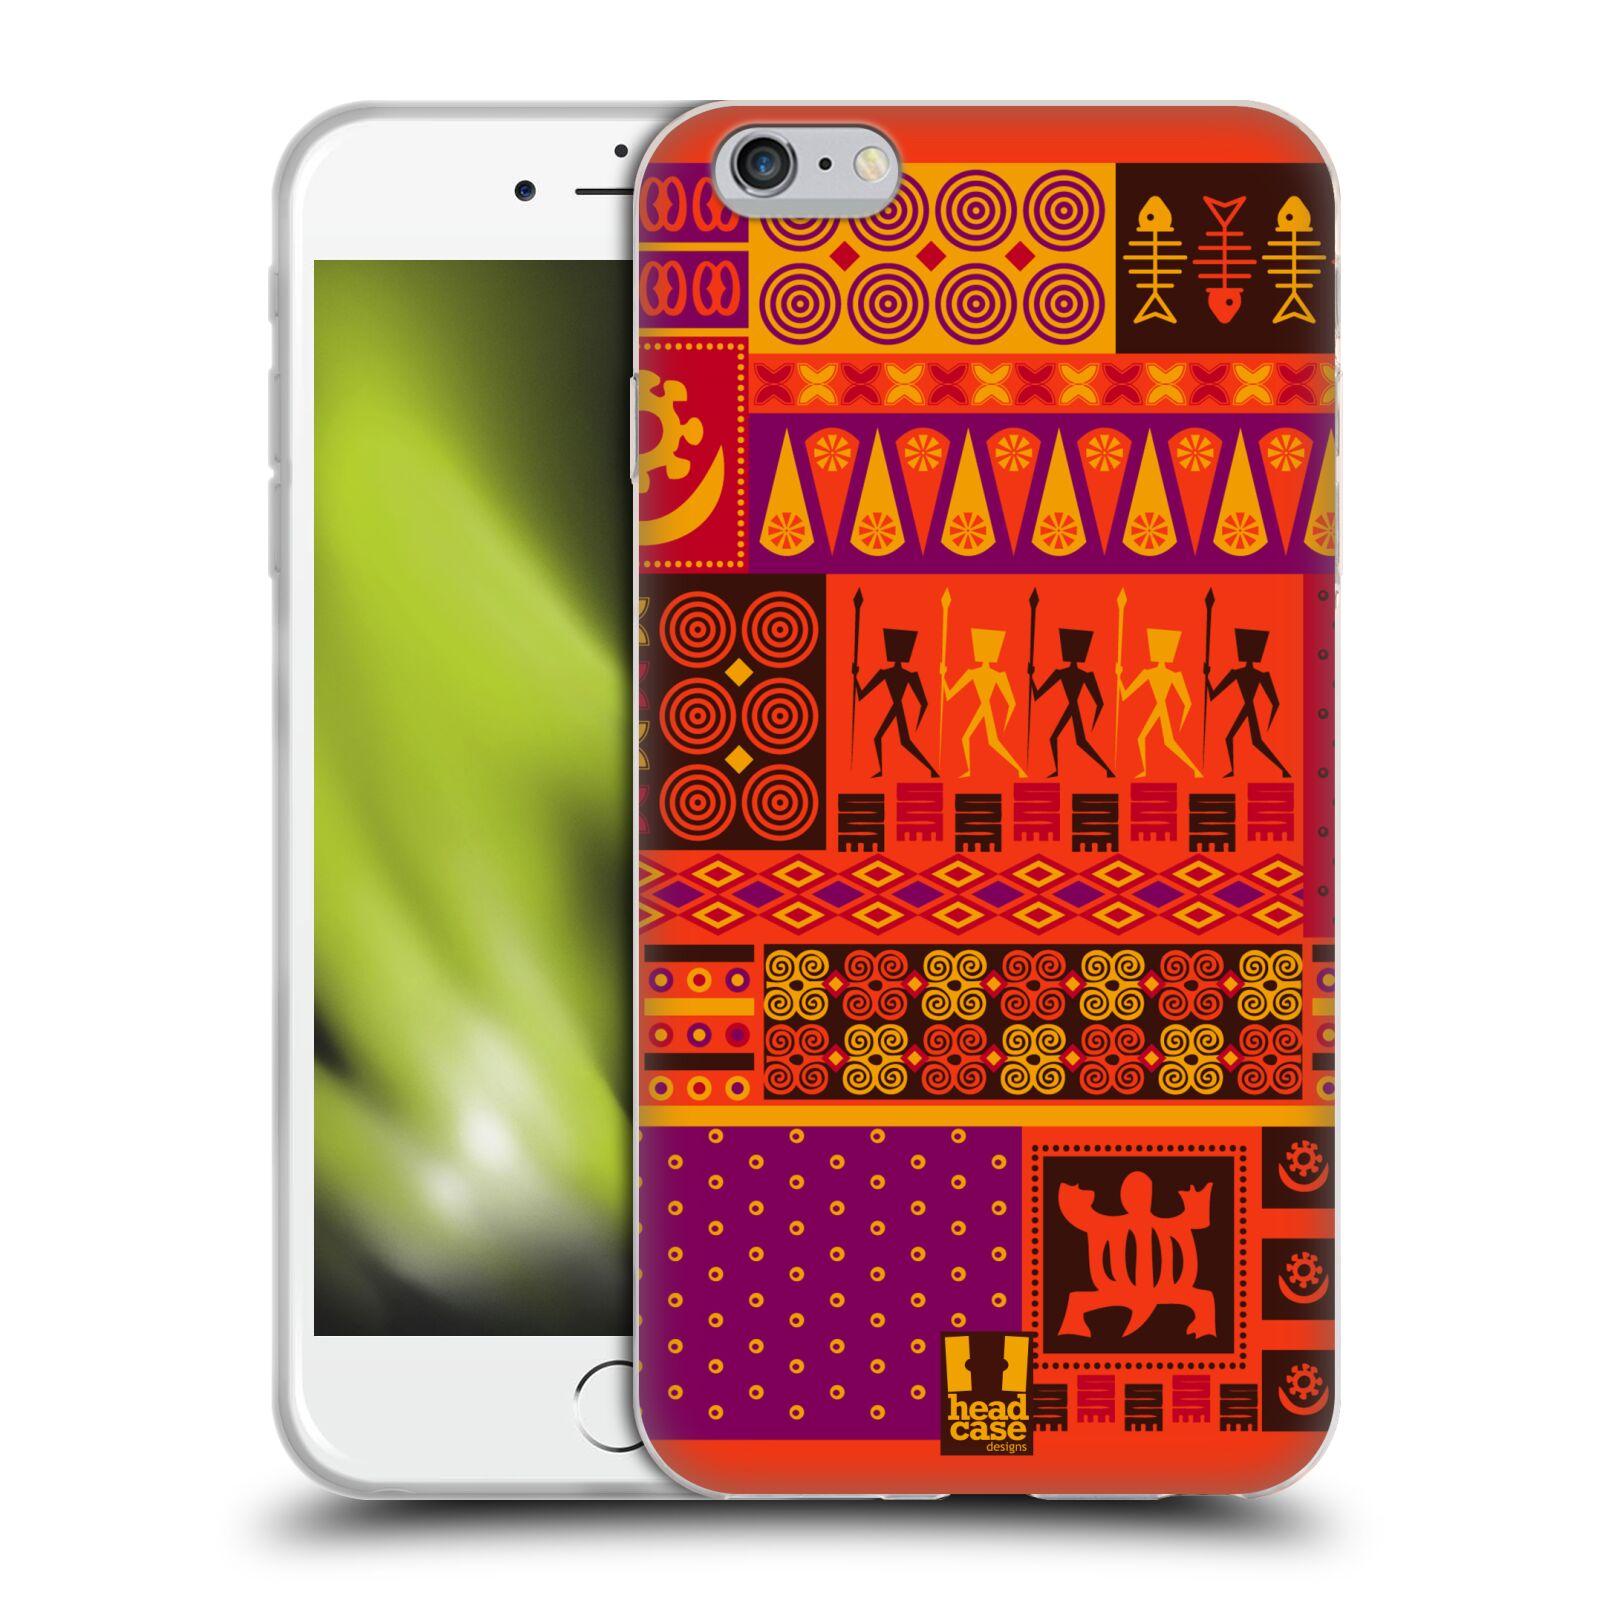 HEAD CASE silikonový obal na mobil Apple Iphone 6 PLUS/ 6S PLUS vzor Africké motivy 2 SAFARI západ slunce